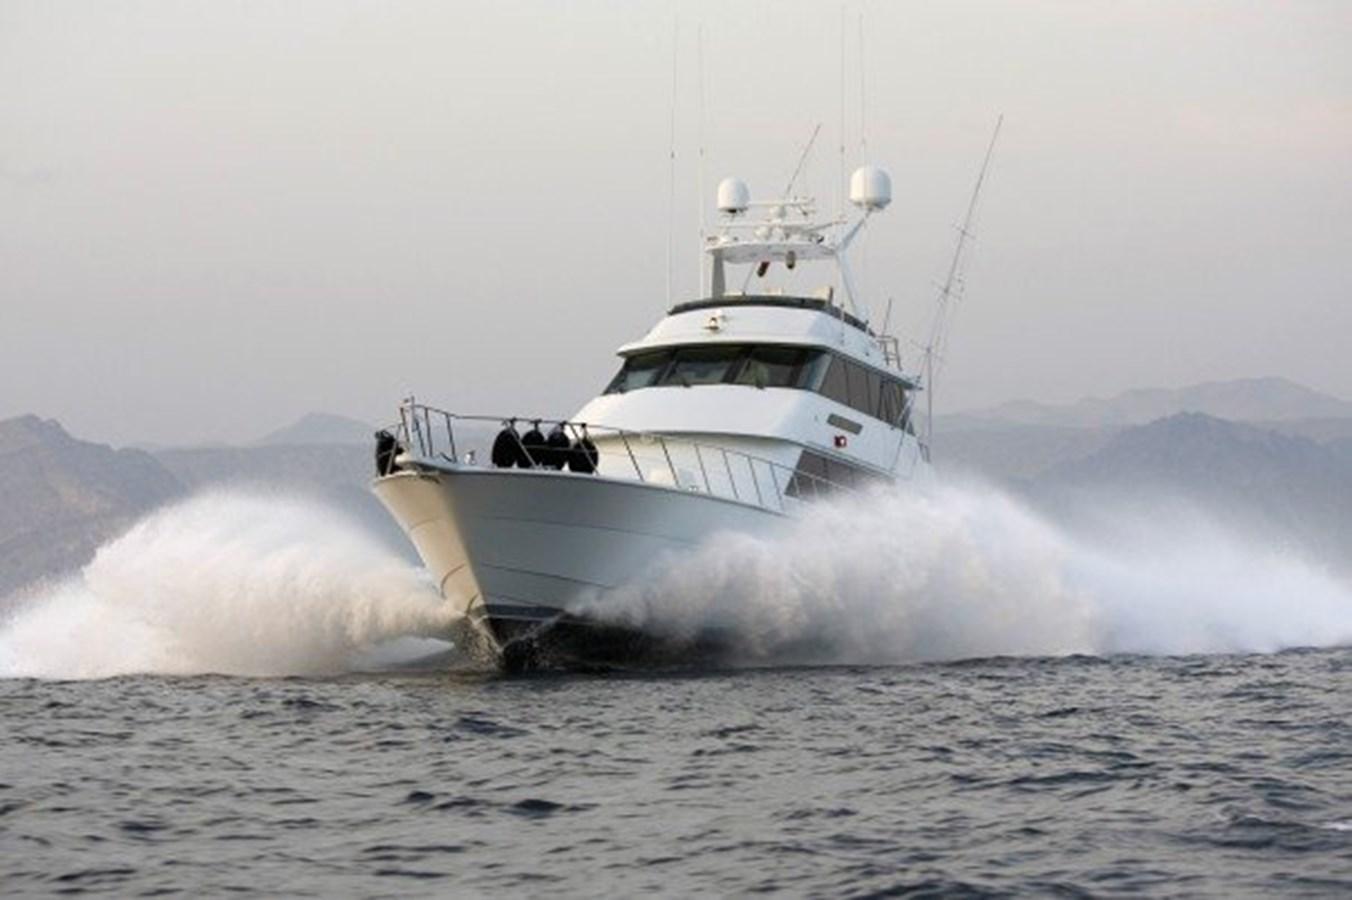 1996 HATTERAS Convertible SF w/ Skylounge Sport Fisherman 1538647